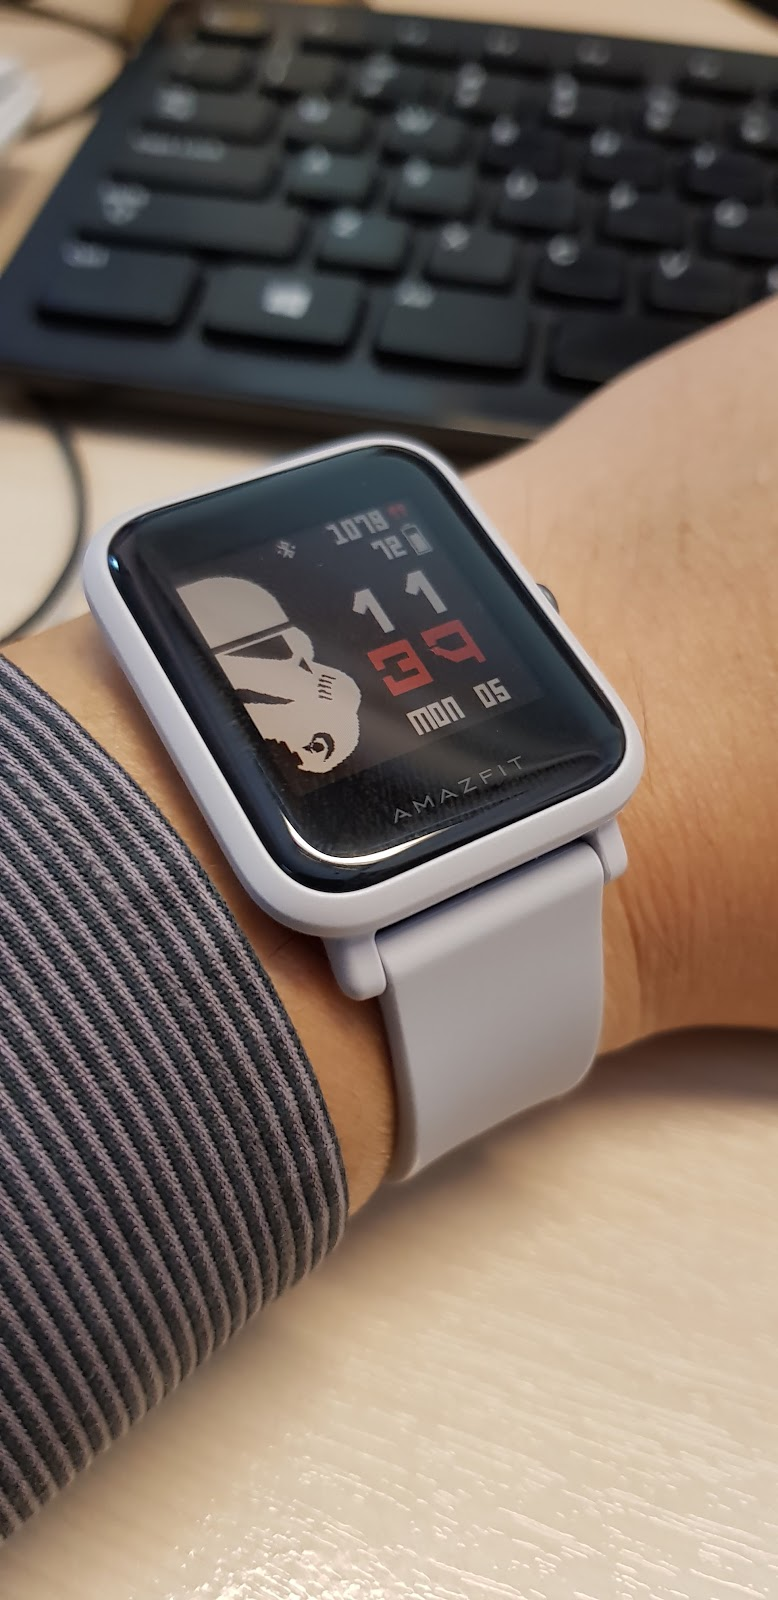 Amazfit Bip Smartwatch review | Doppelganger! Beware